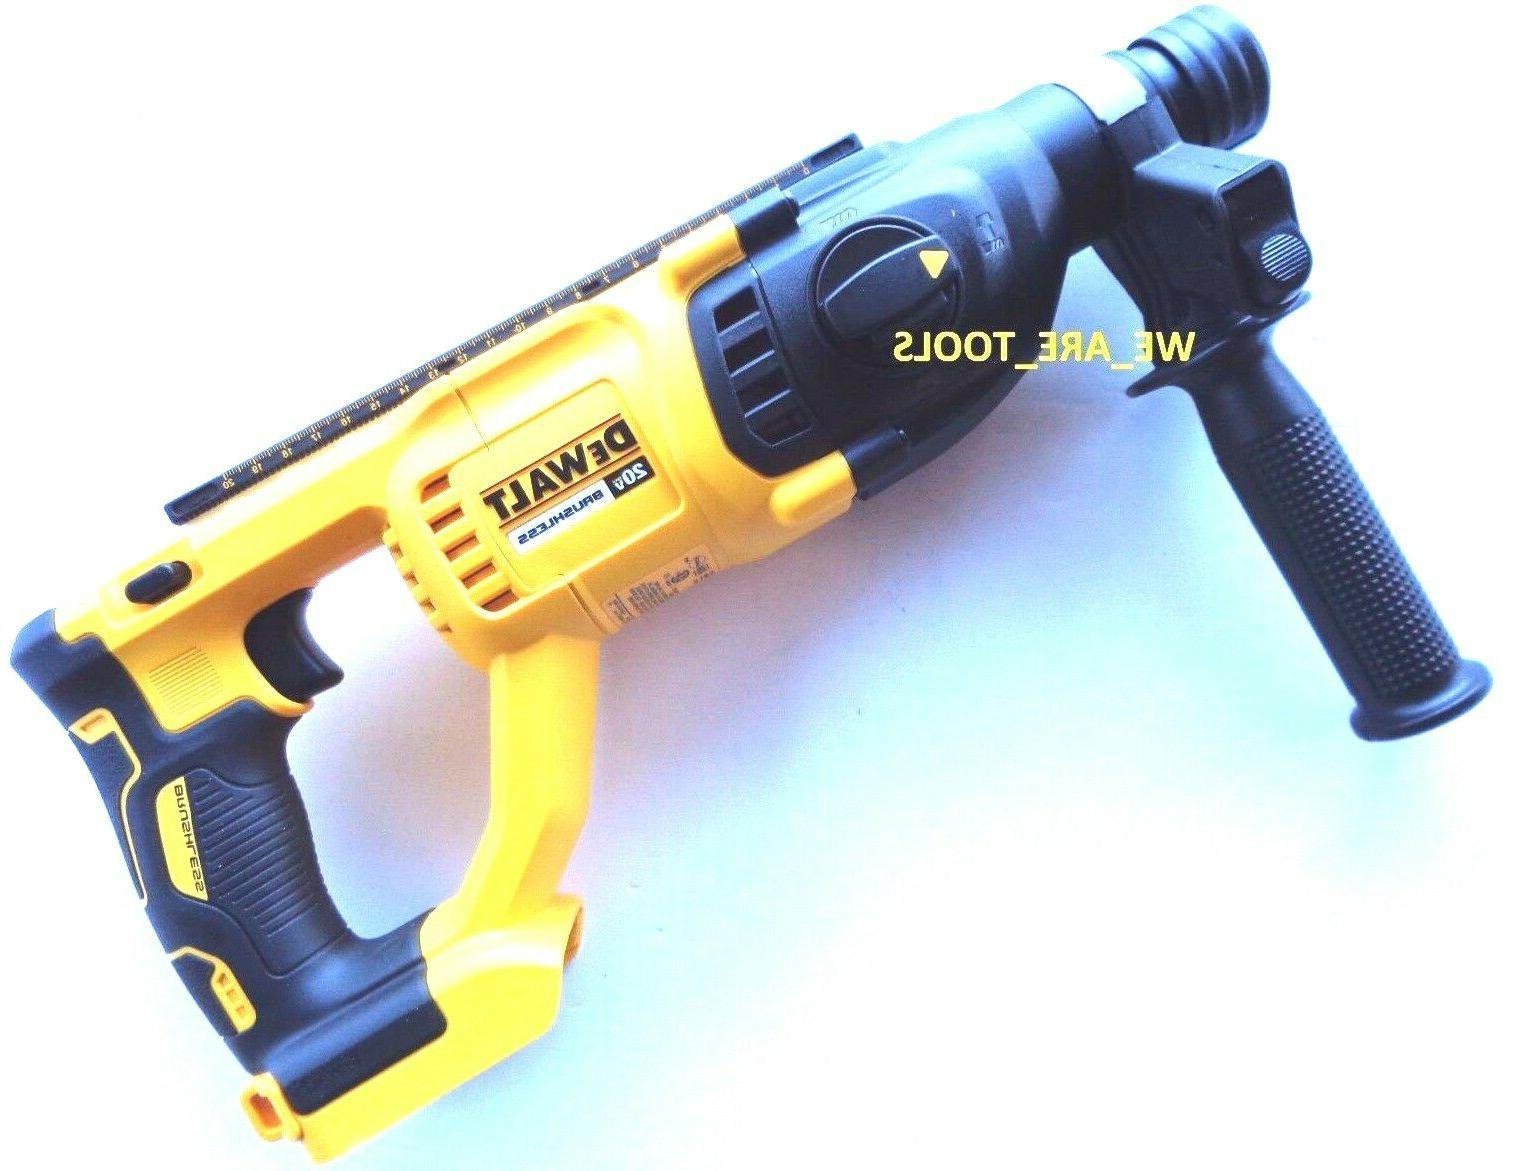 New Dewalt SDS Hammer Drill, DCB205 Battery 20 Volt